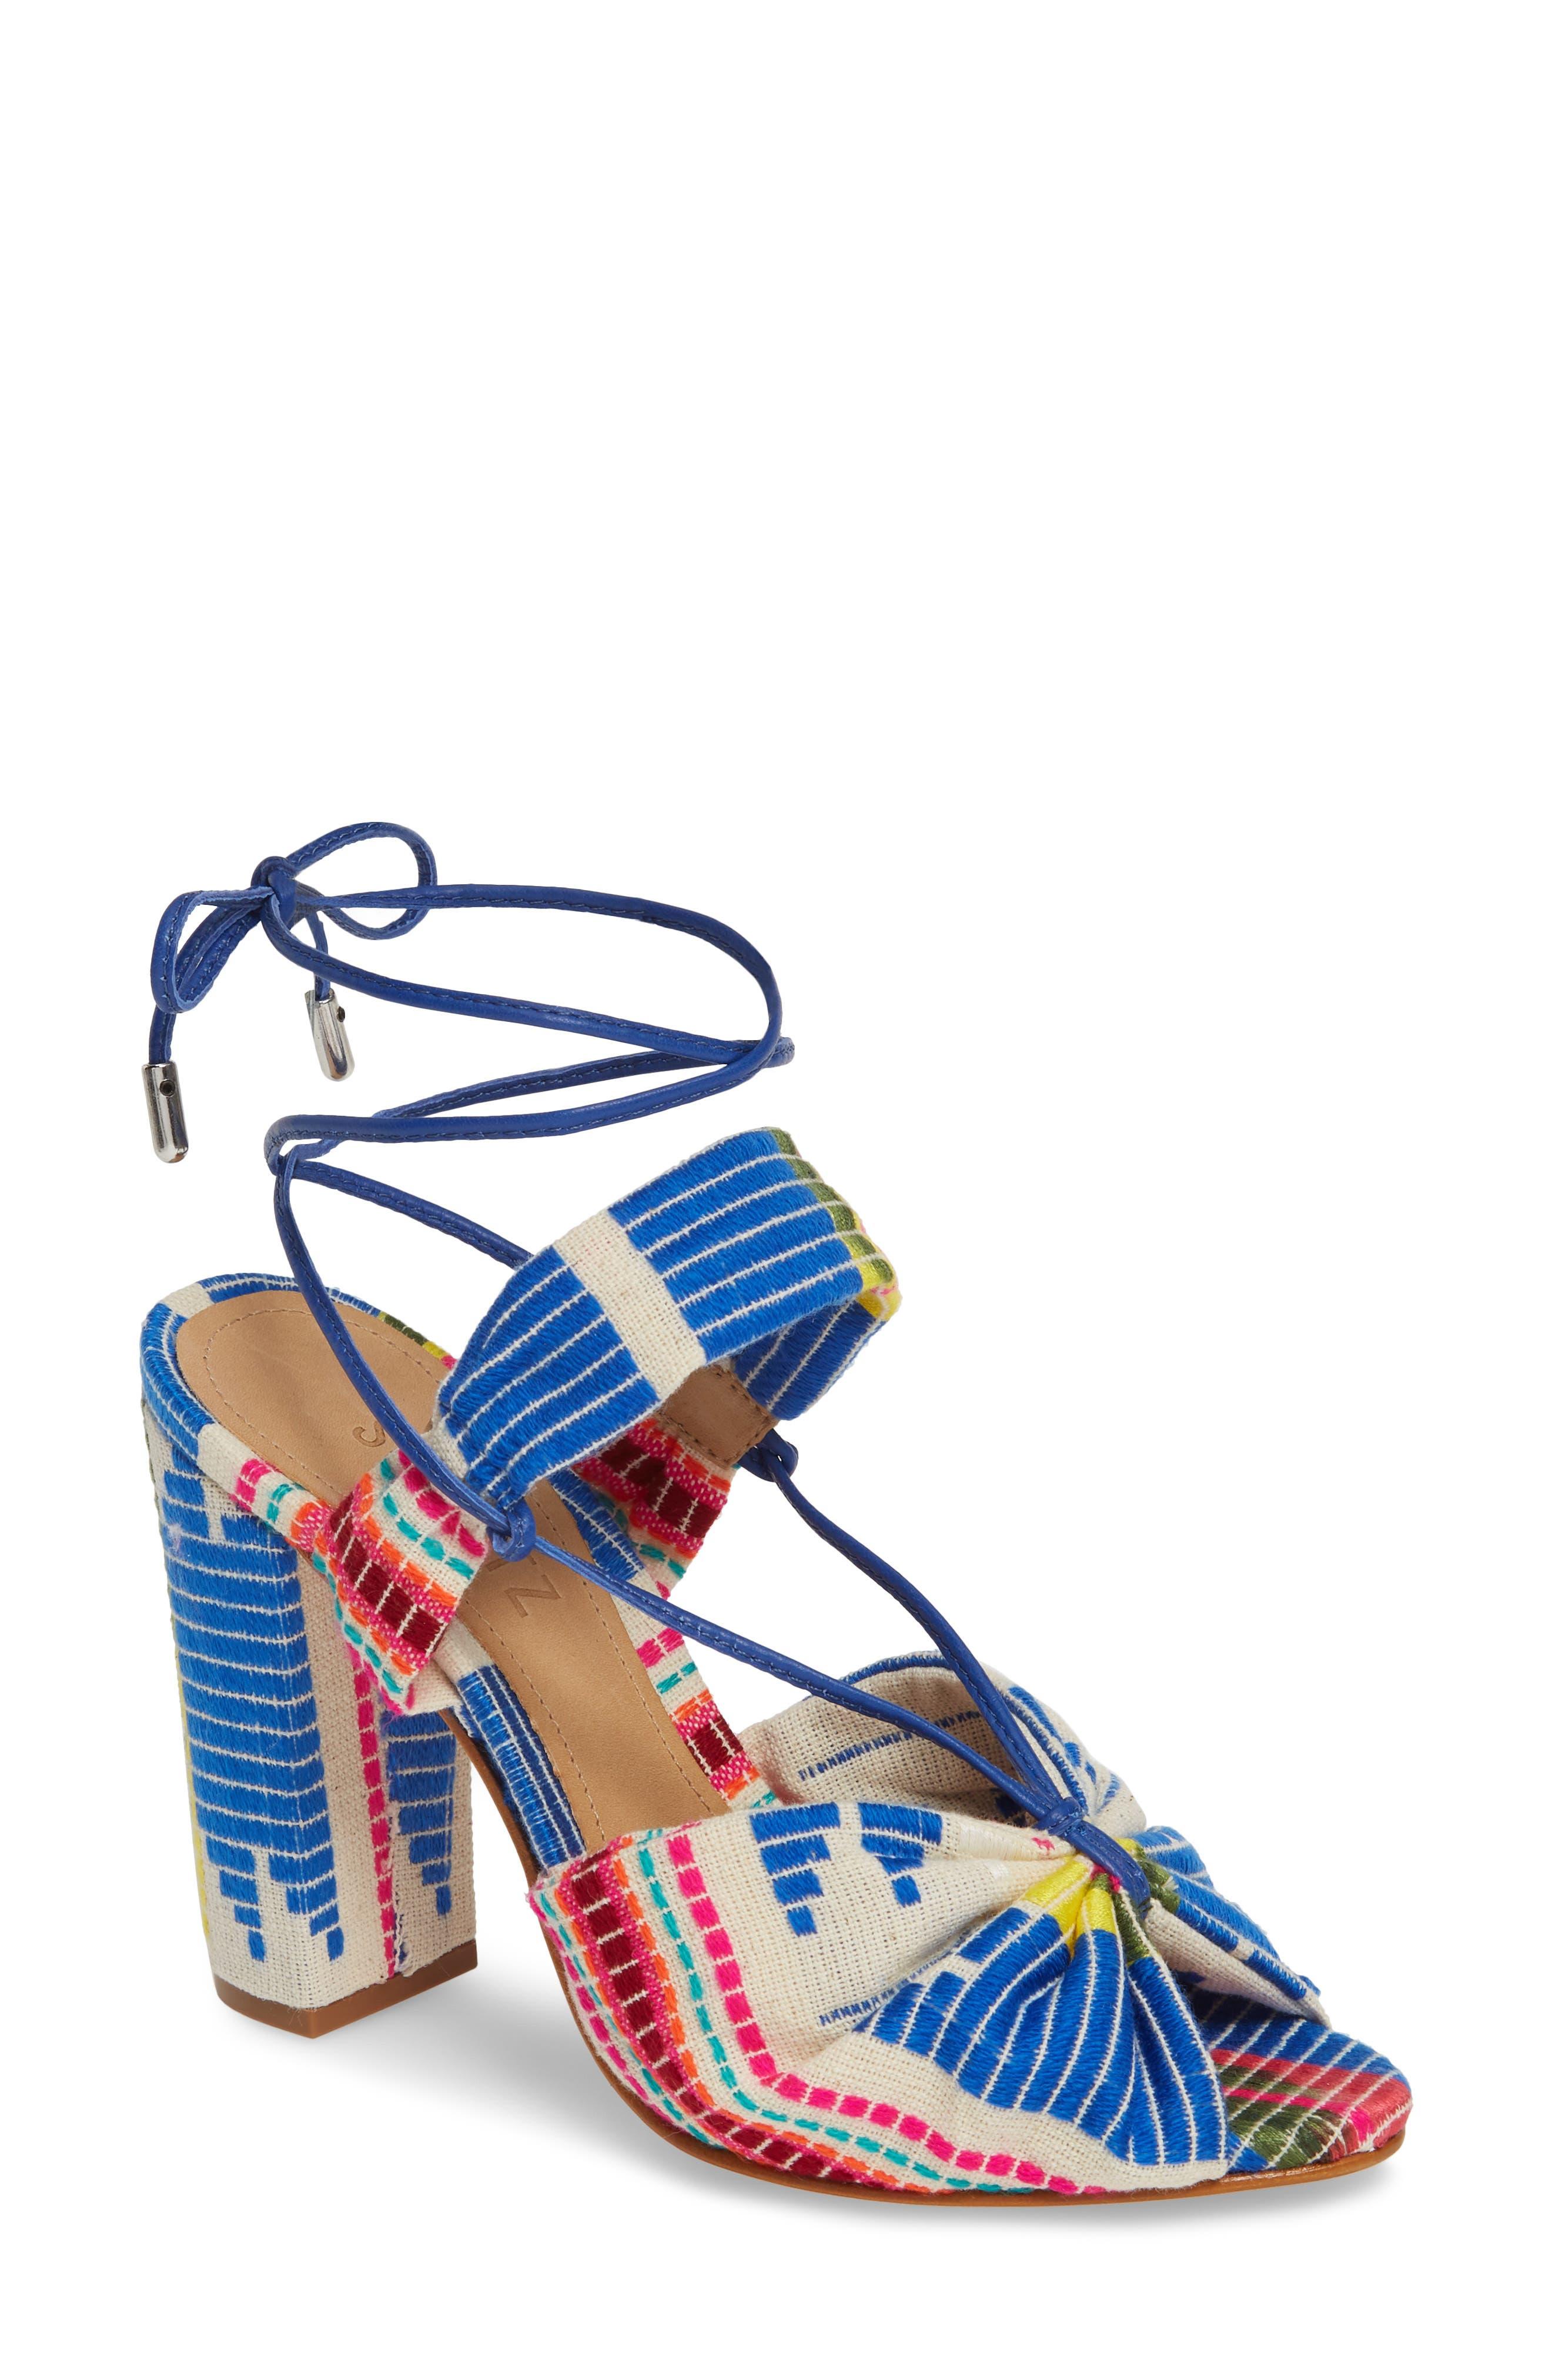 Schutz Ailika Lace-Up Sandal- Blue